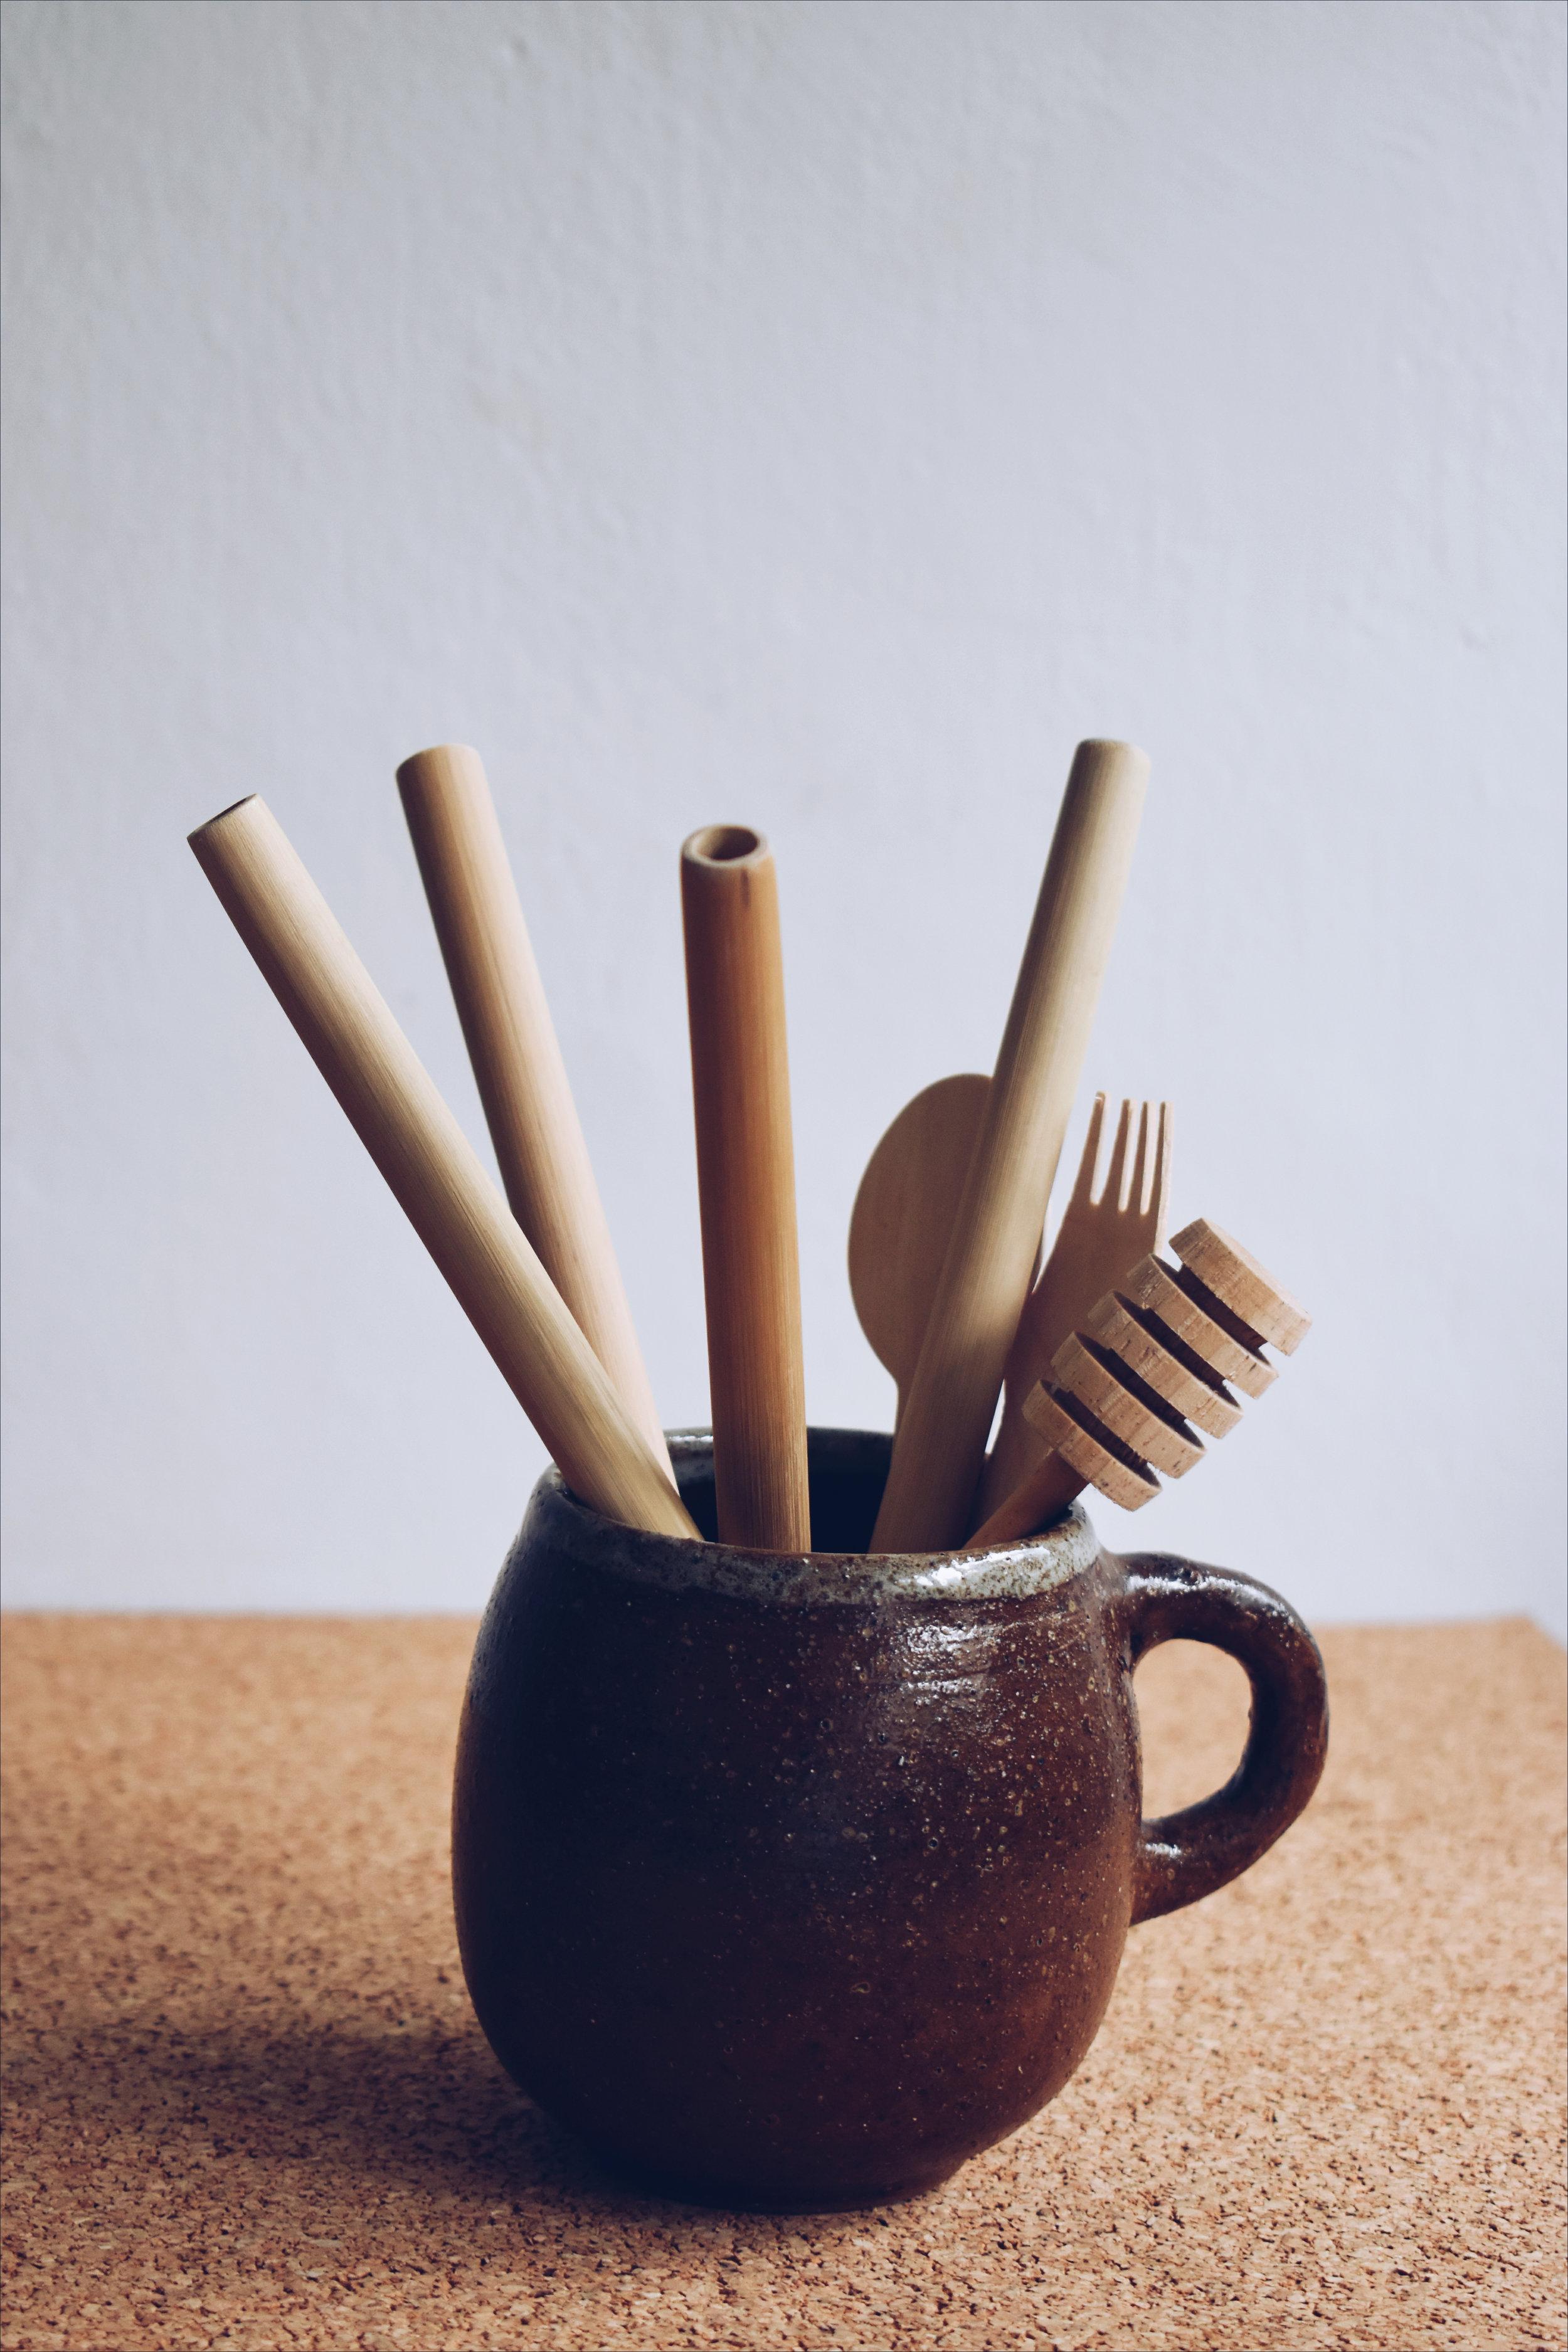 Bamboo drinking straws